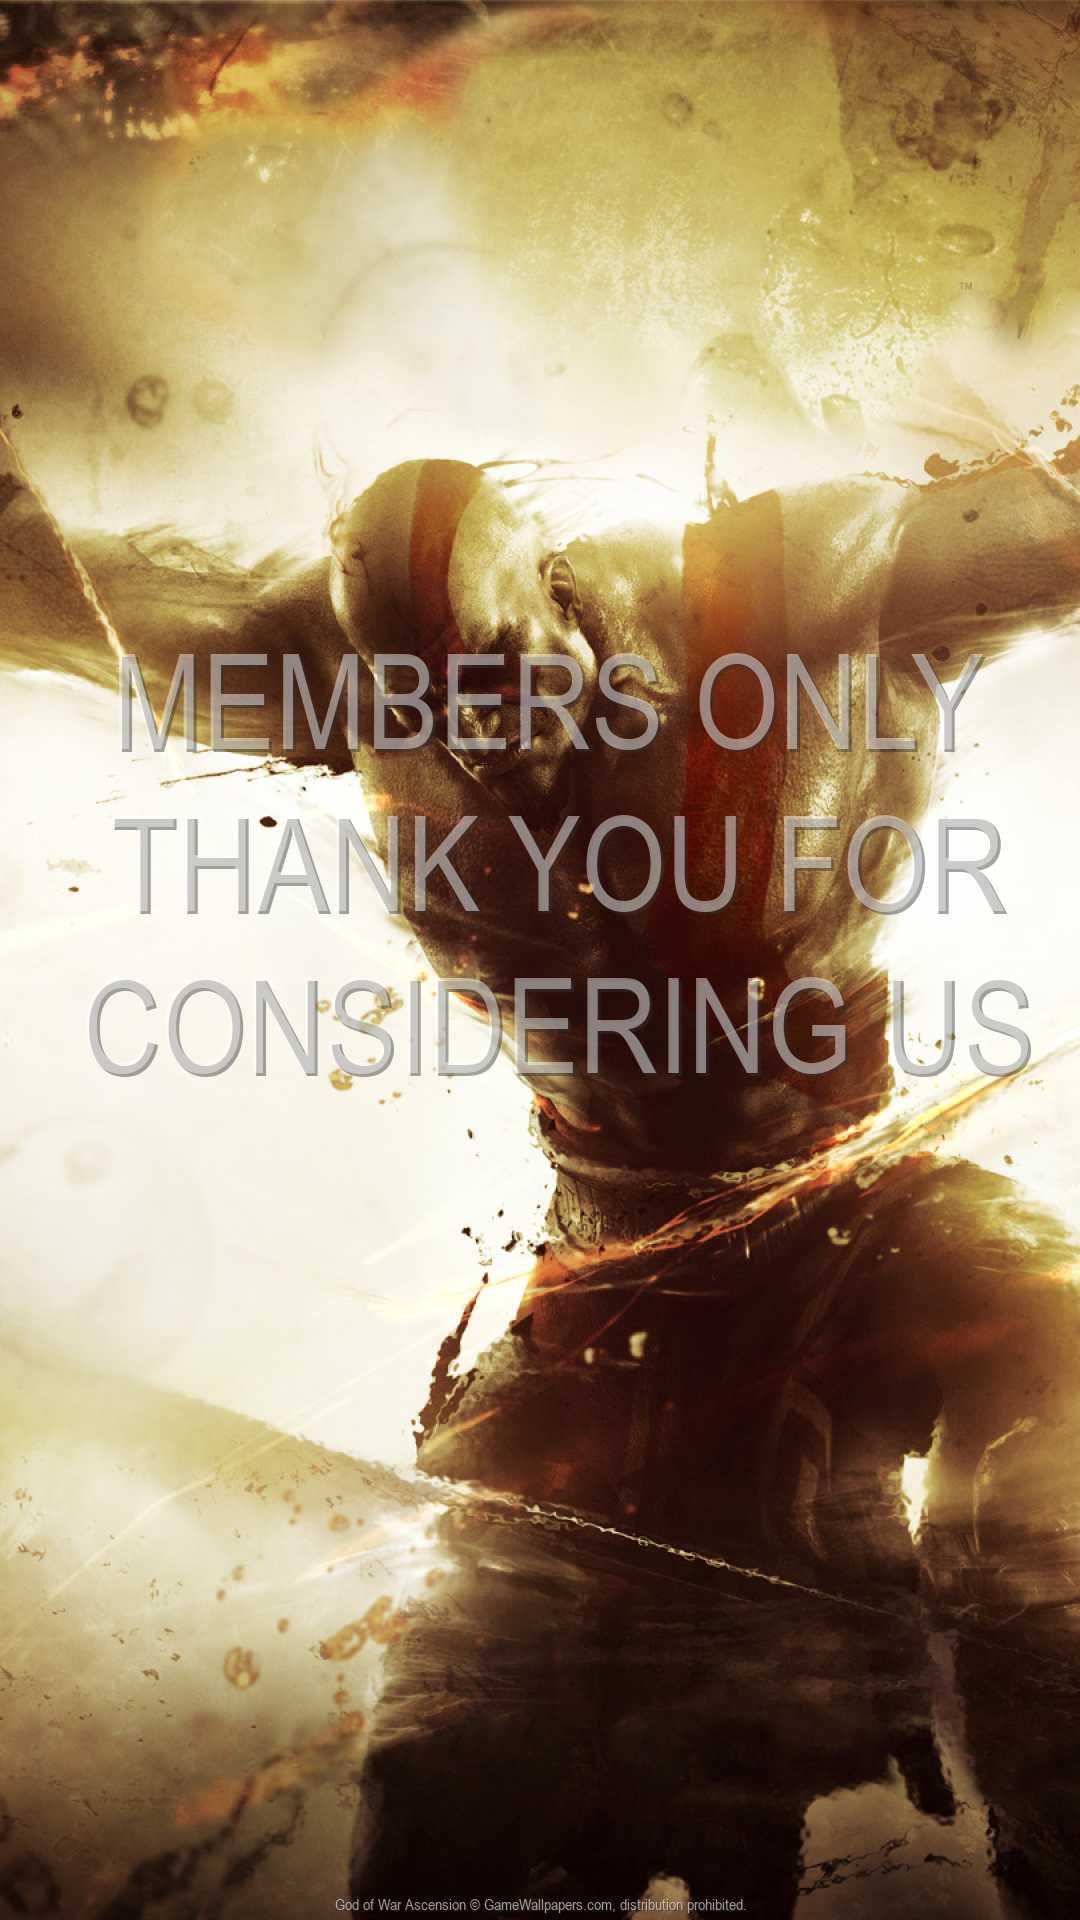 God of War: Ascension 1080p Vertical Handy Hintergrundbild 01